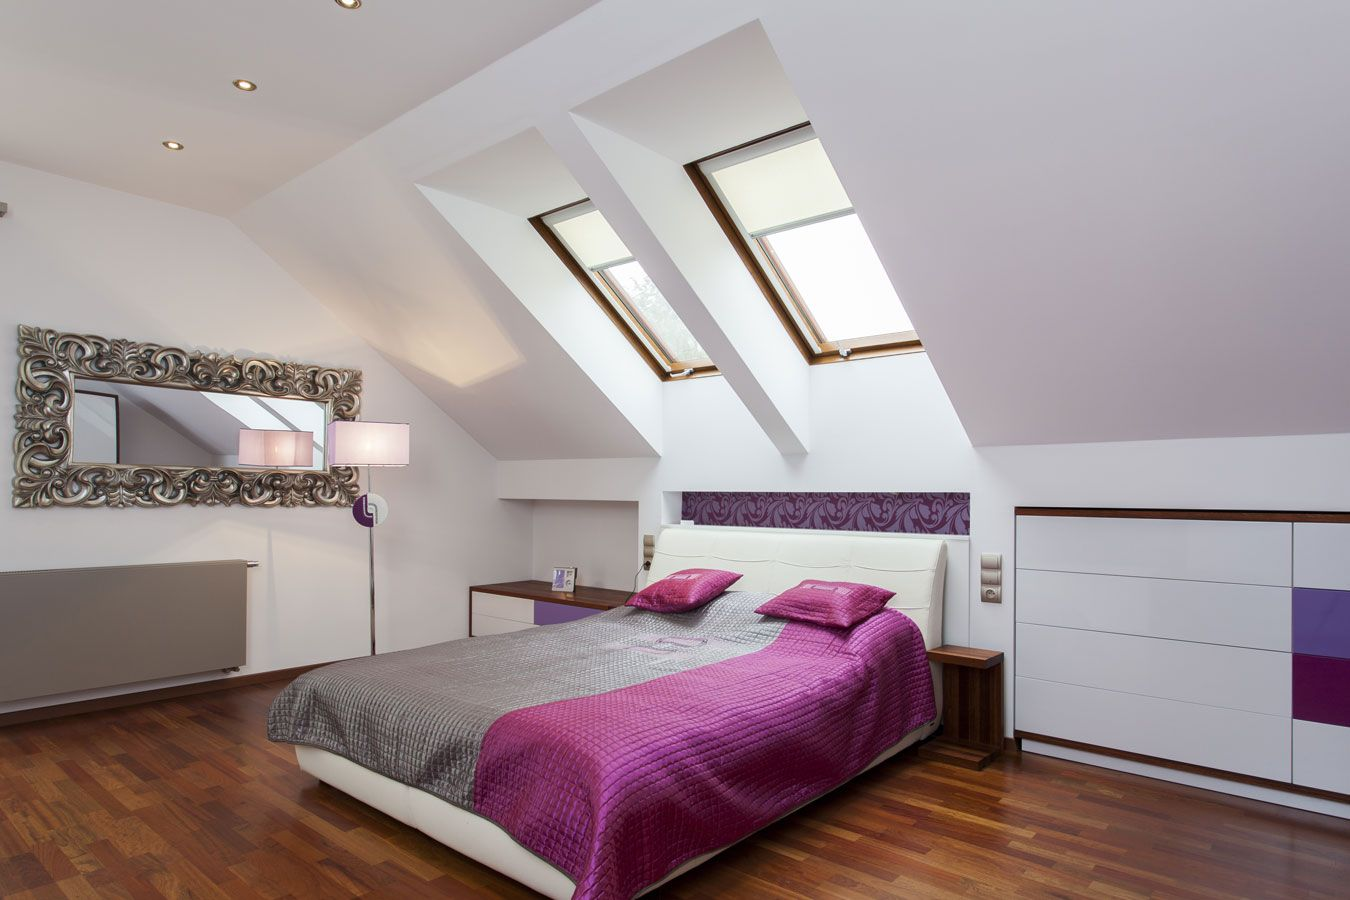 Inbouwkasten - slaapkamer op zolder | obývák | Pinterest | Loft ...